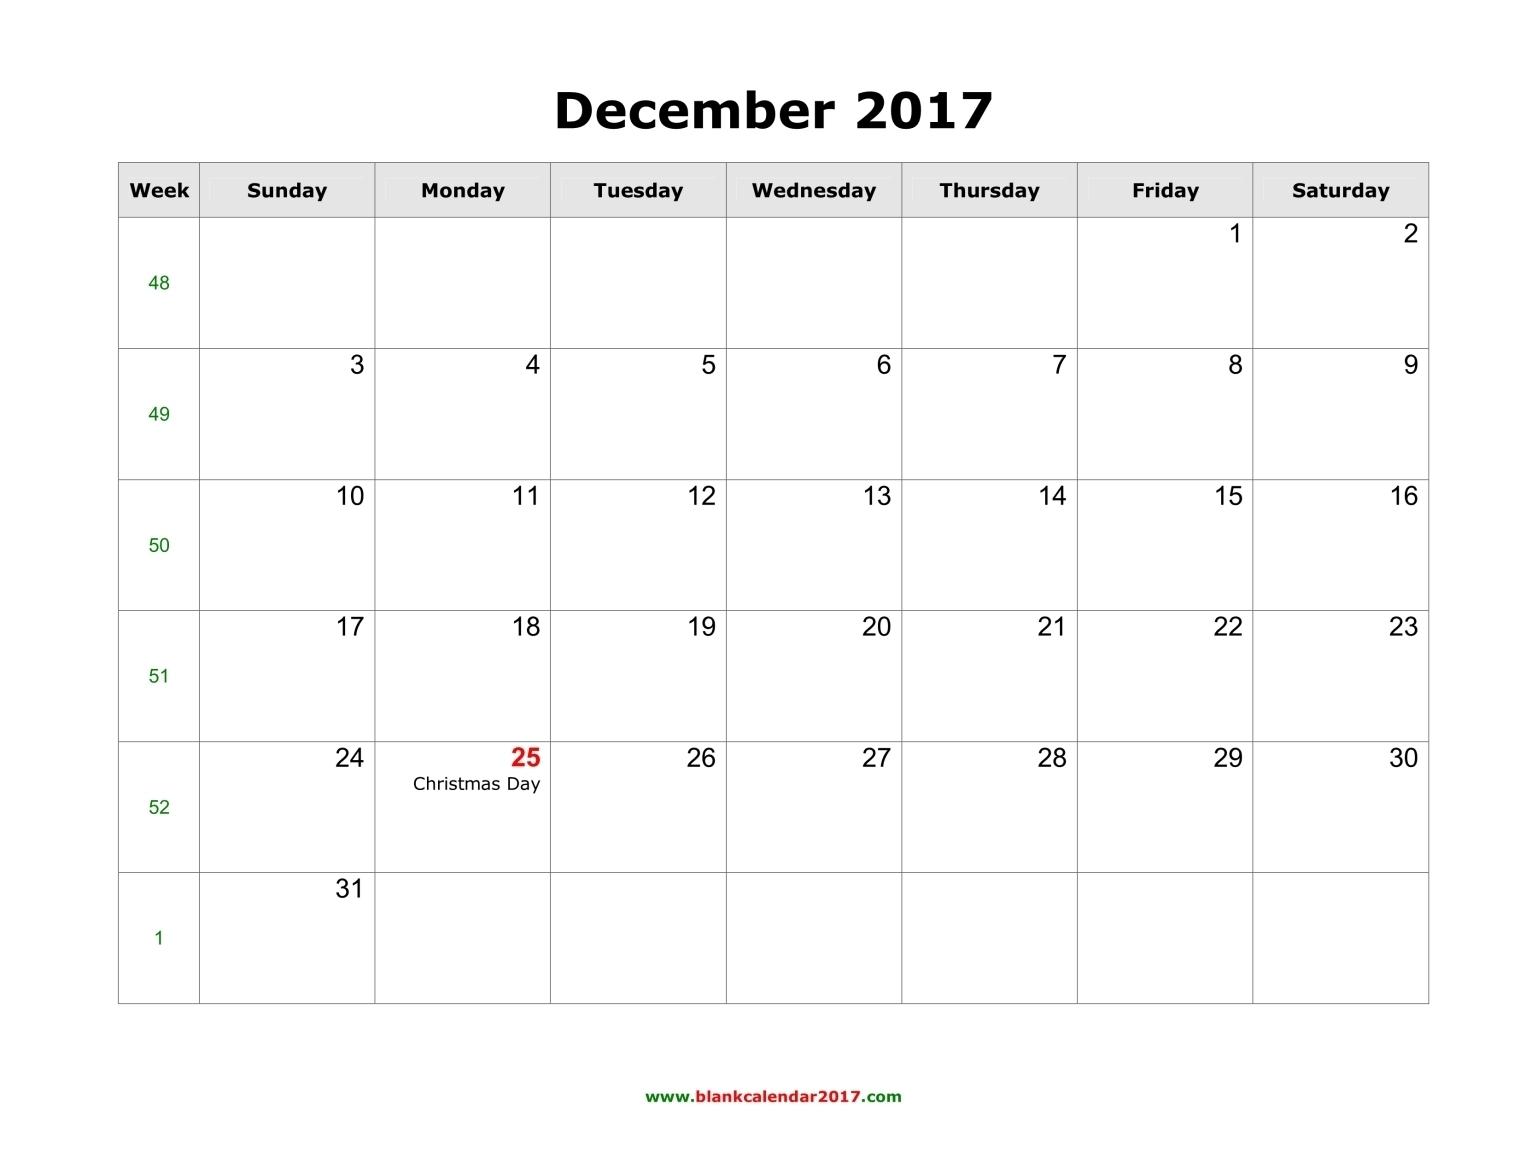 Blank Calendar For December 2017 89uj